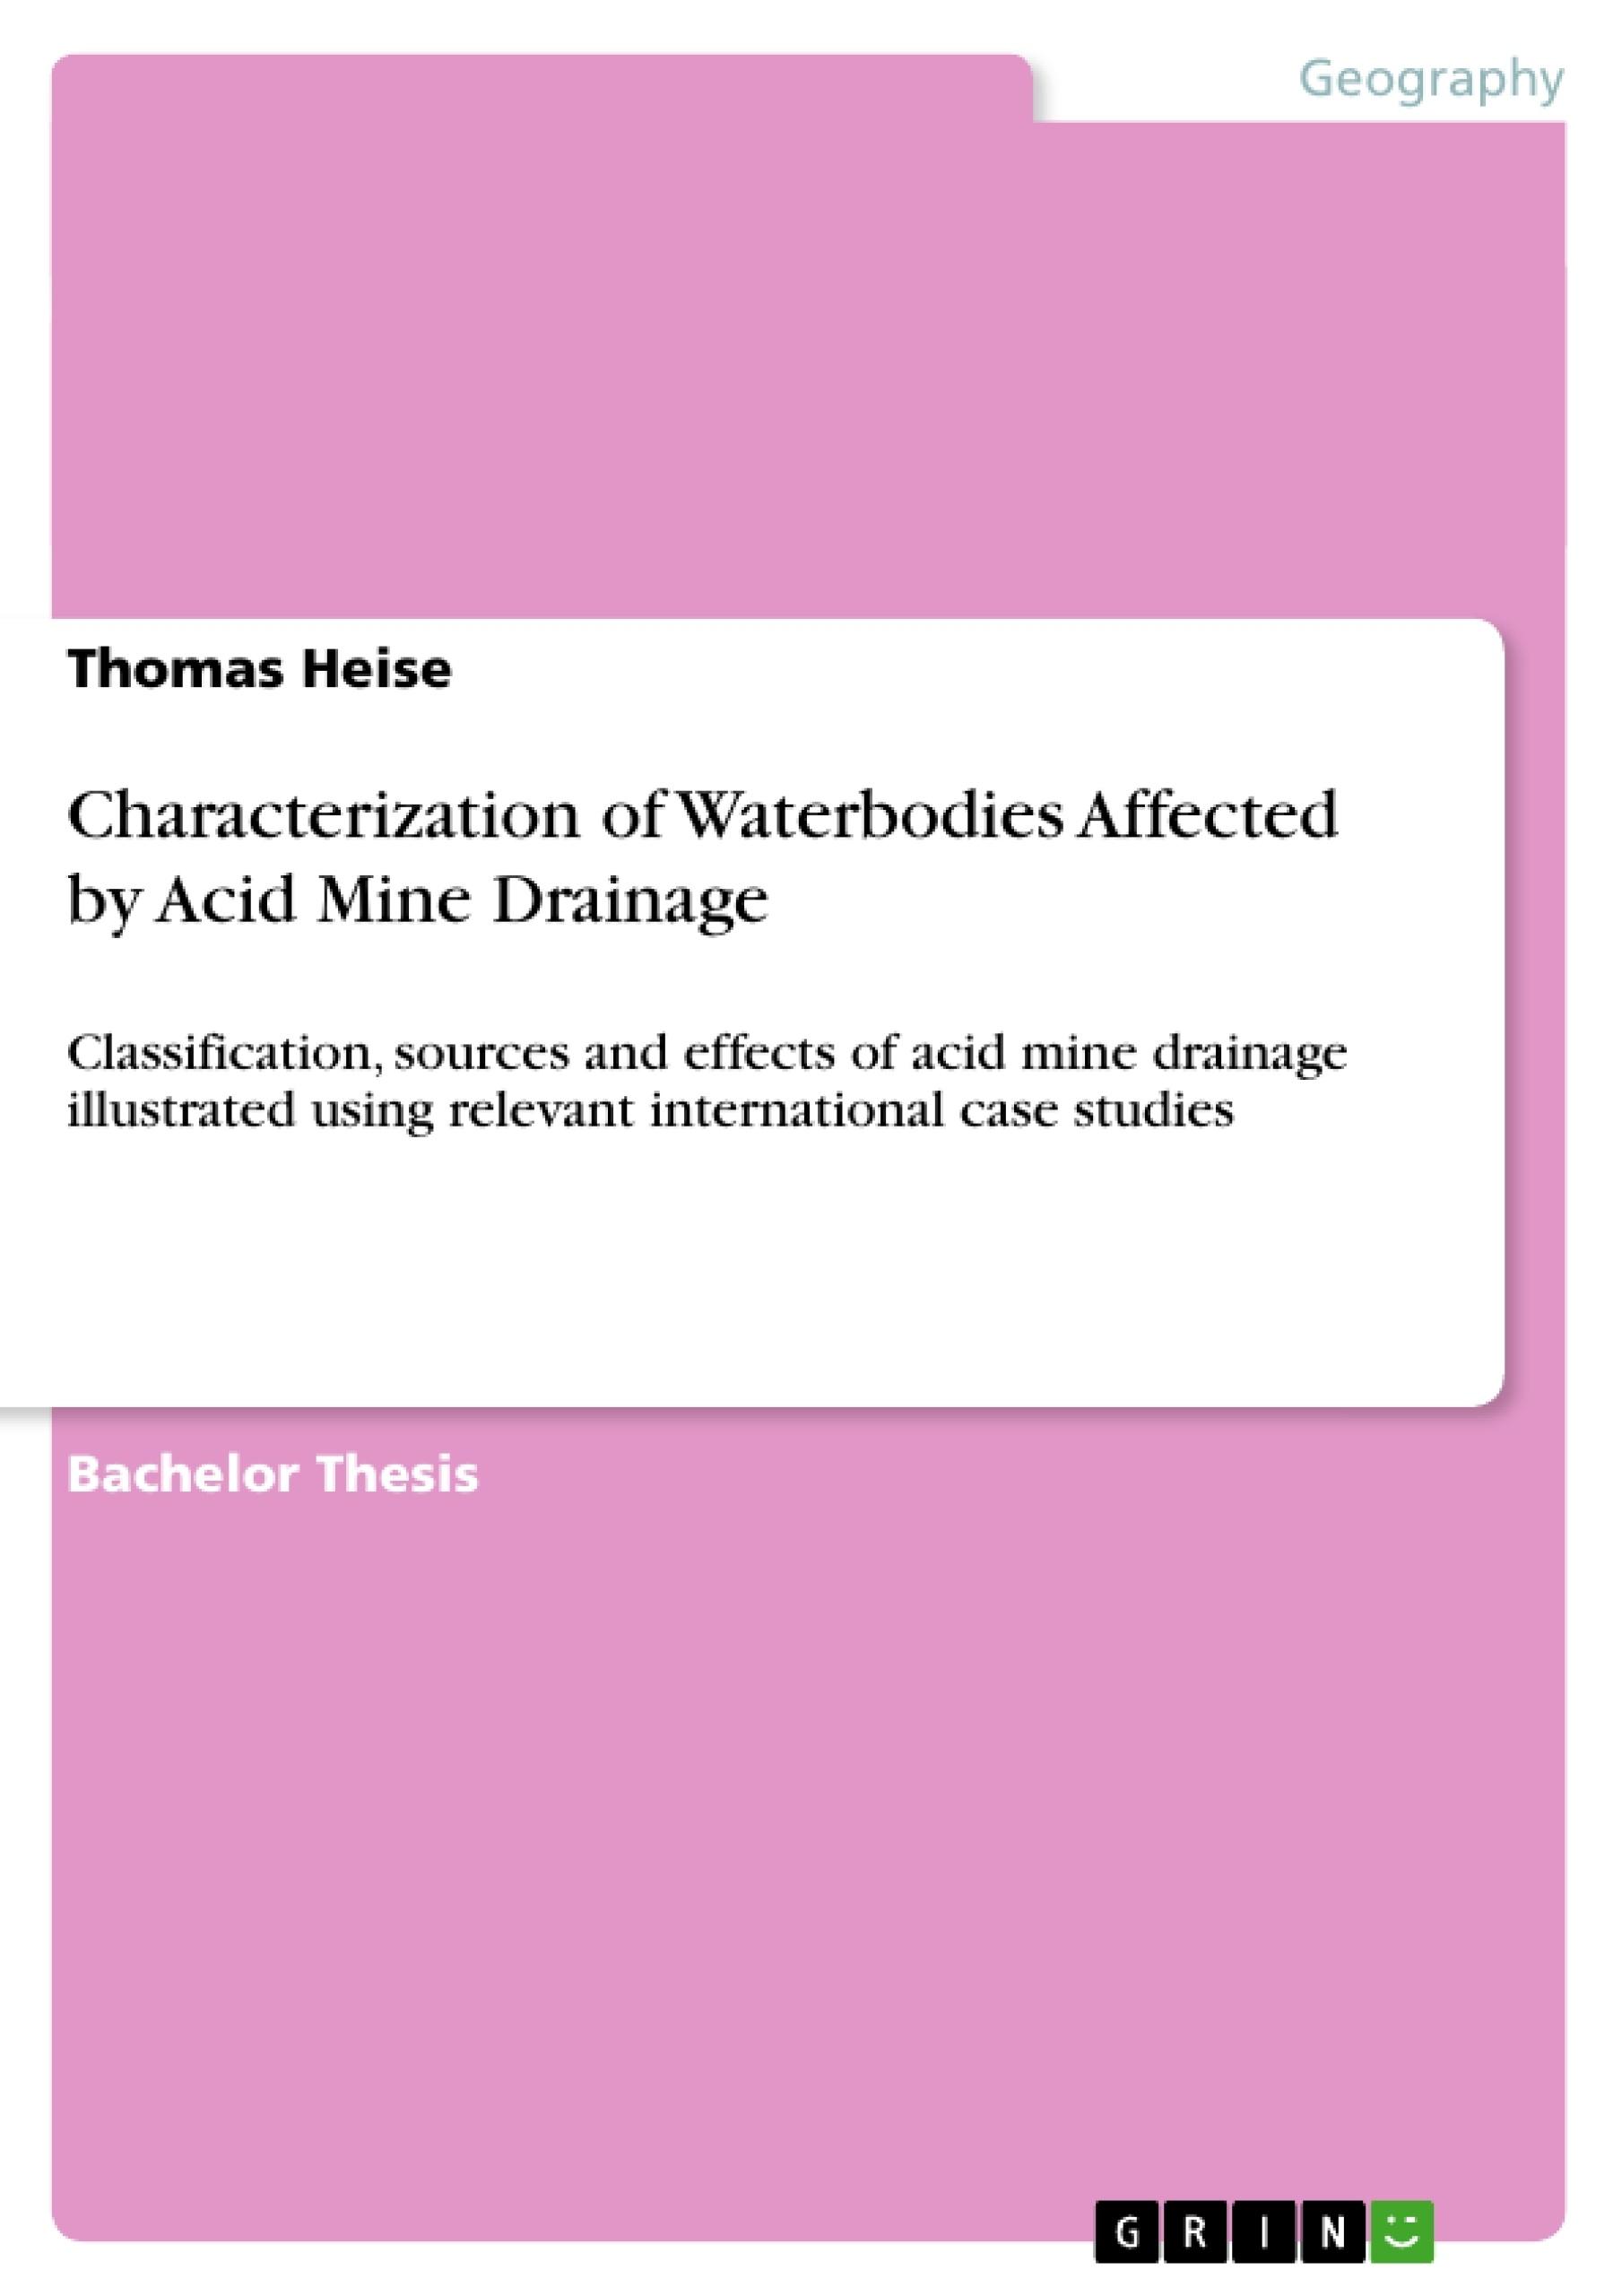 characterization thesis